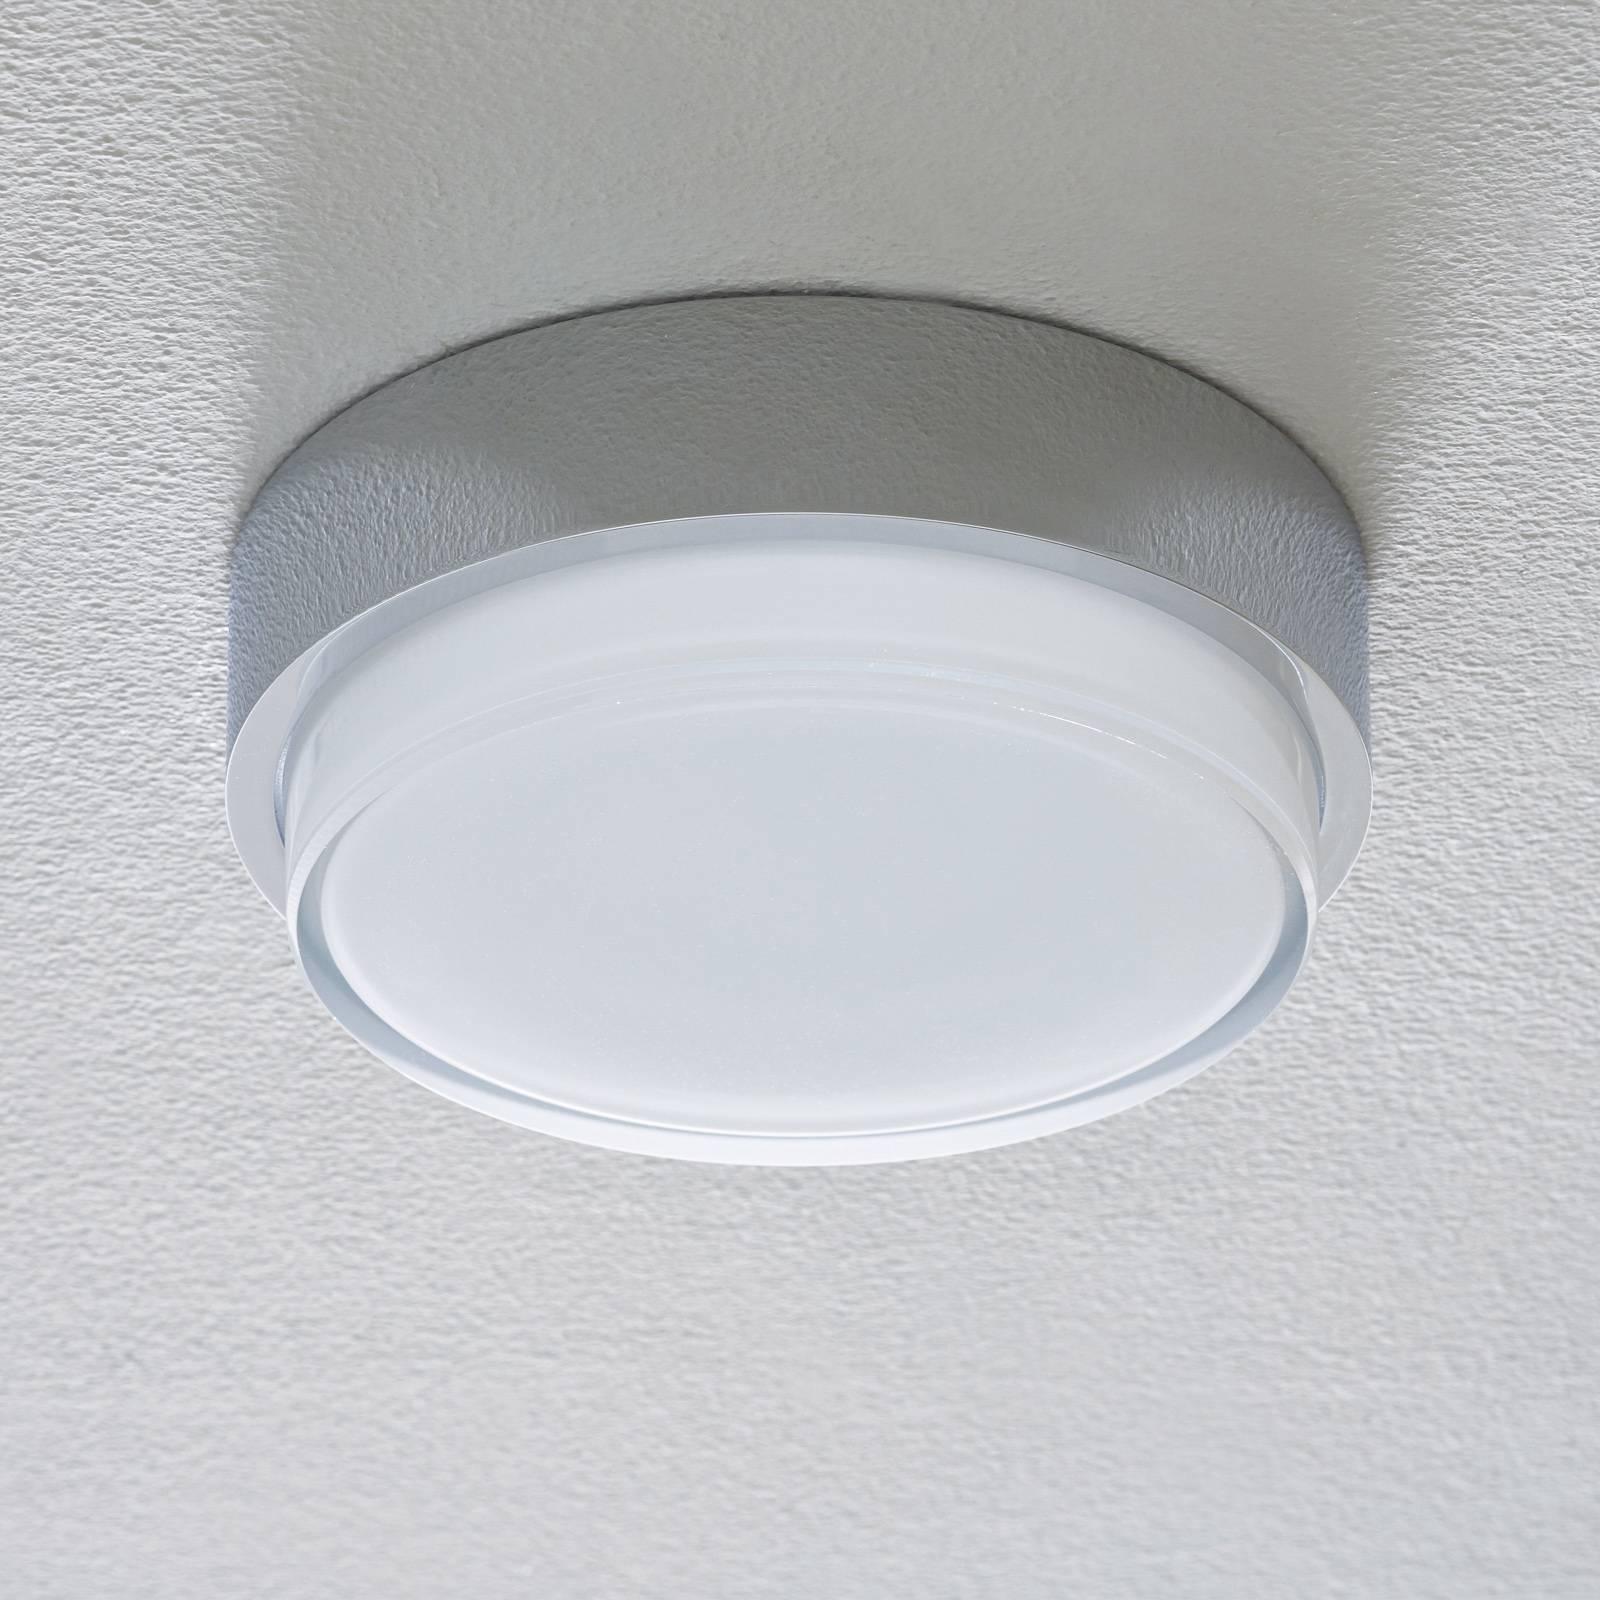 BEGA 50536 LED-kattovalaisin 930 kromi Ø21cm